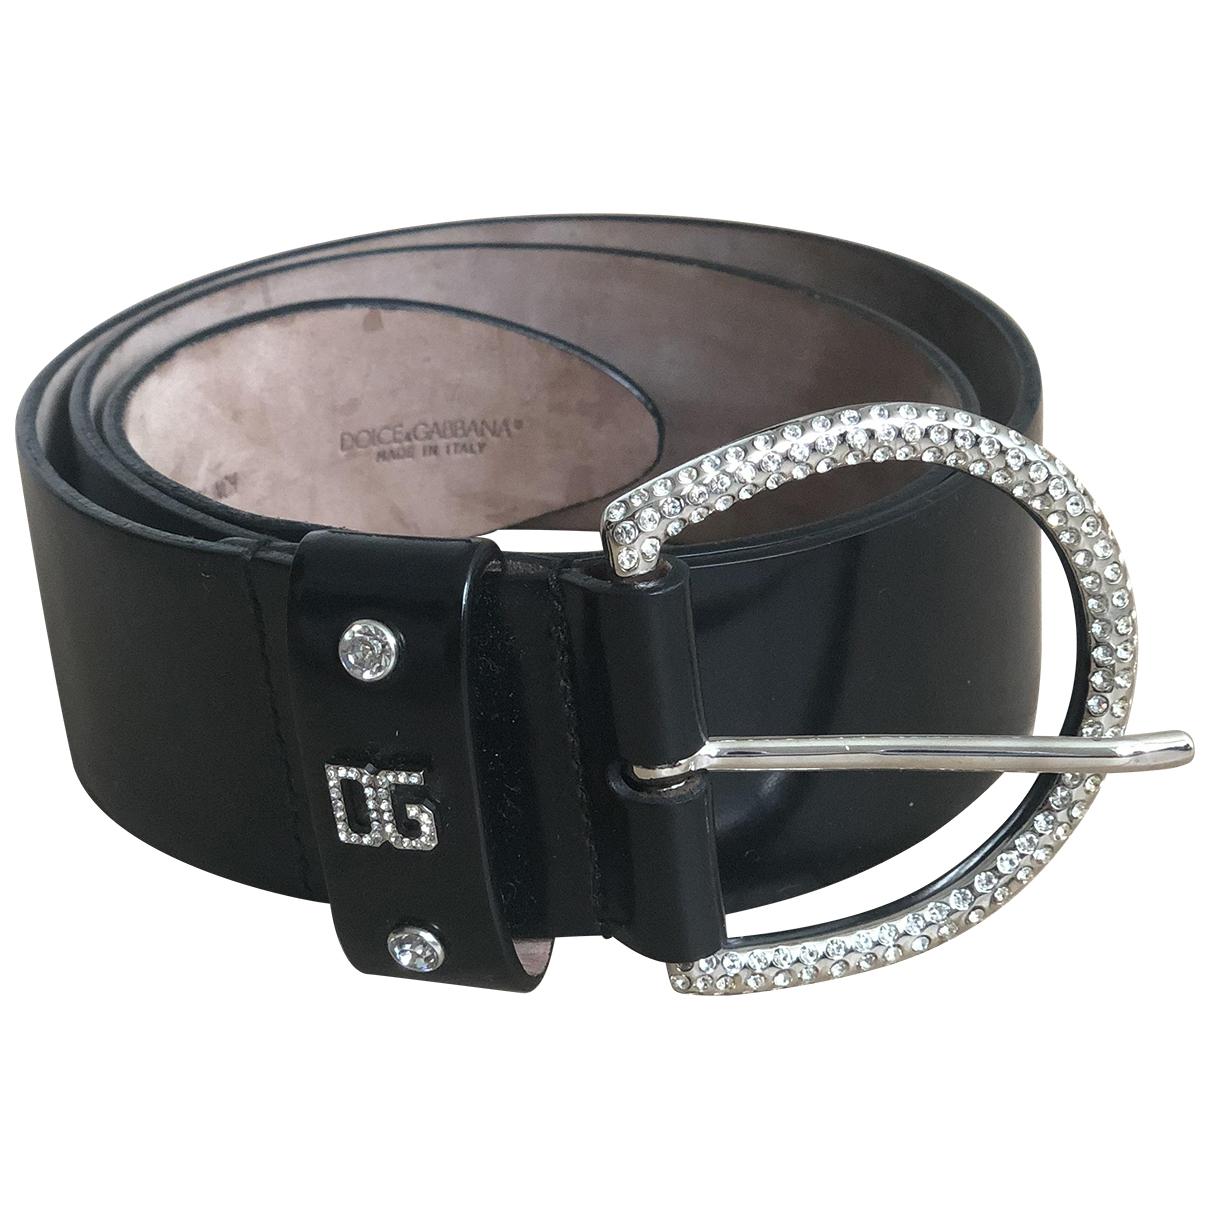 Dolce & Gabbana \N Black Leather belt for Women 85 cm